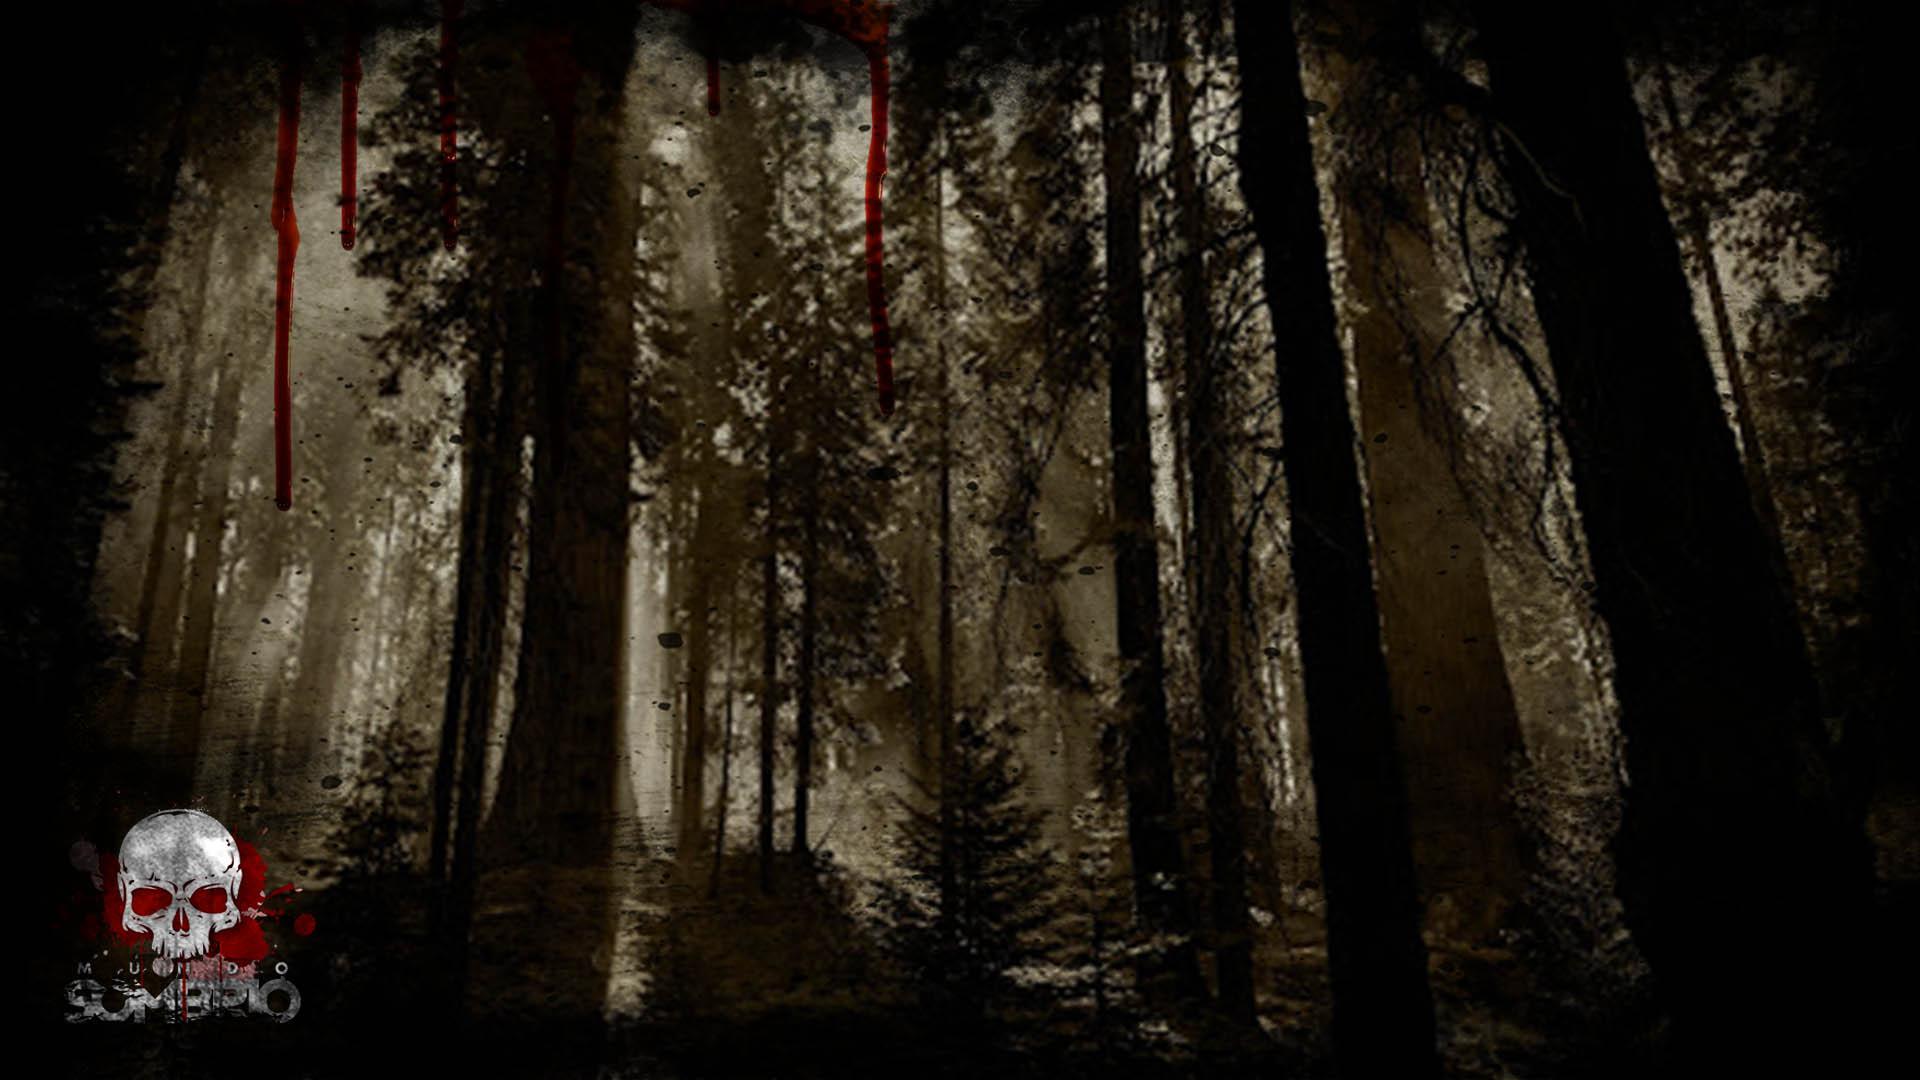 a floresta história de terror mundo sombrio